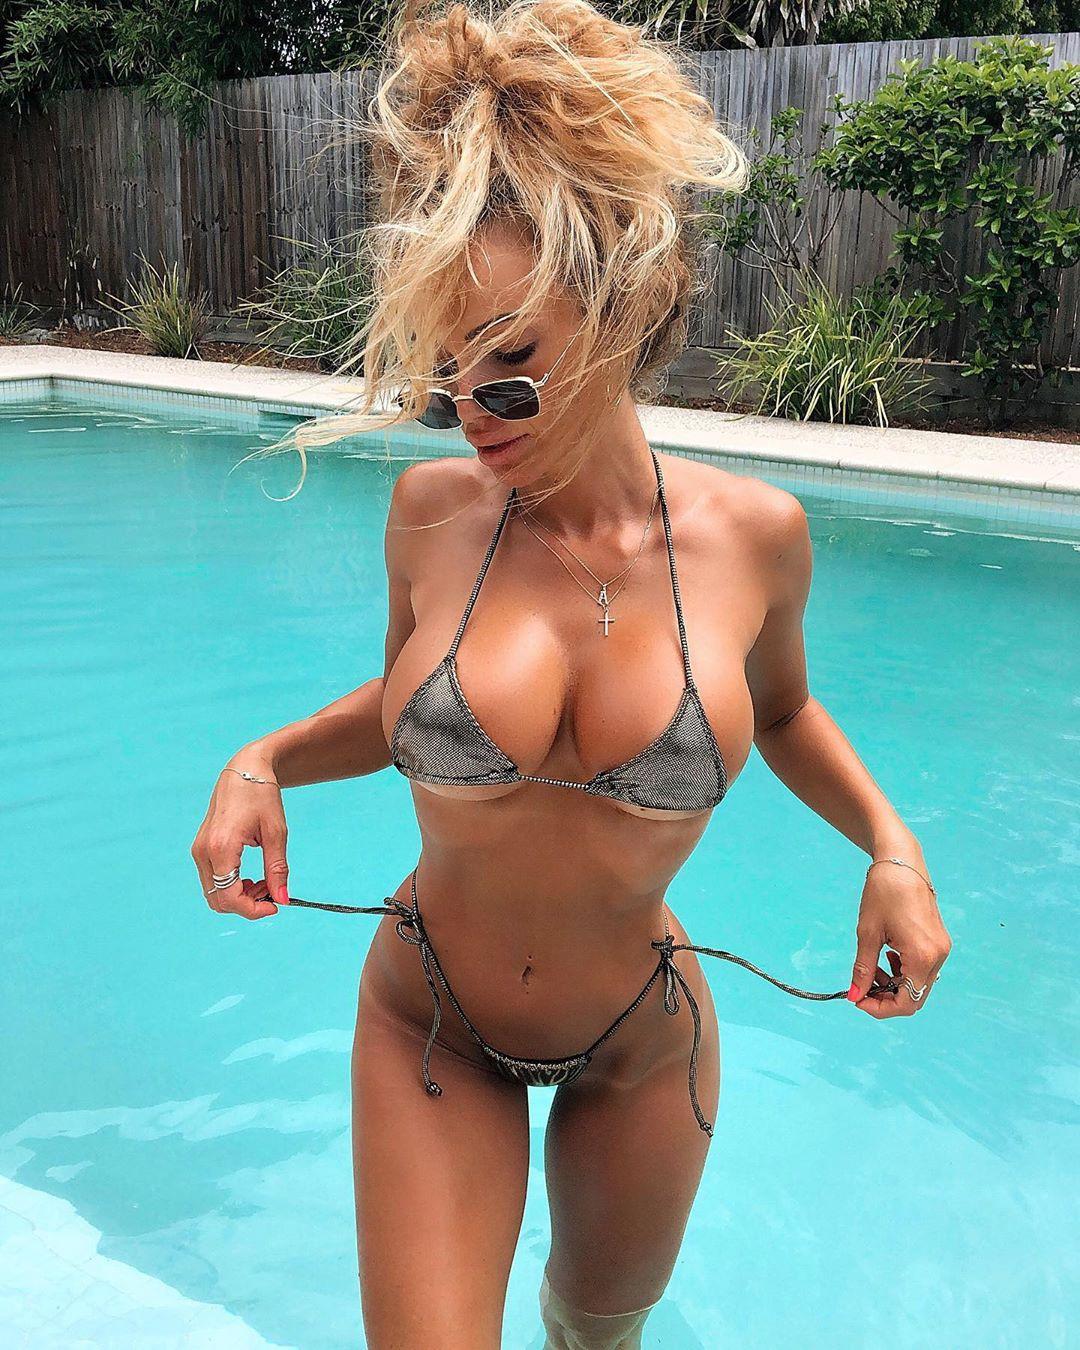 Abby Dowse lingerie, bikini swimwear outfits for girls